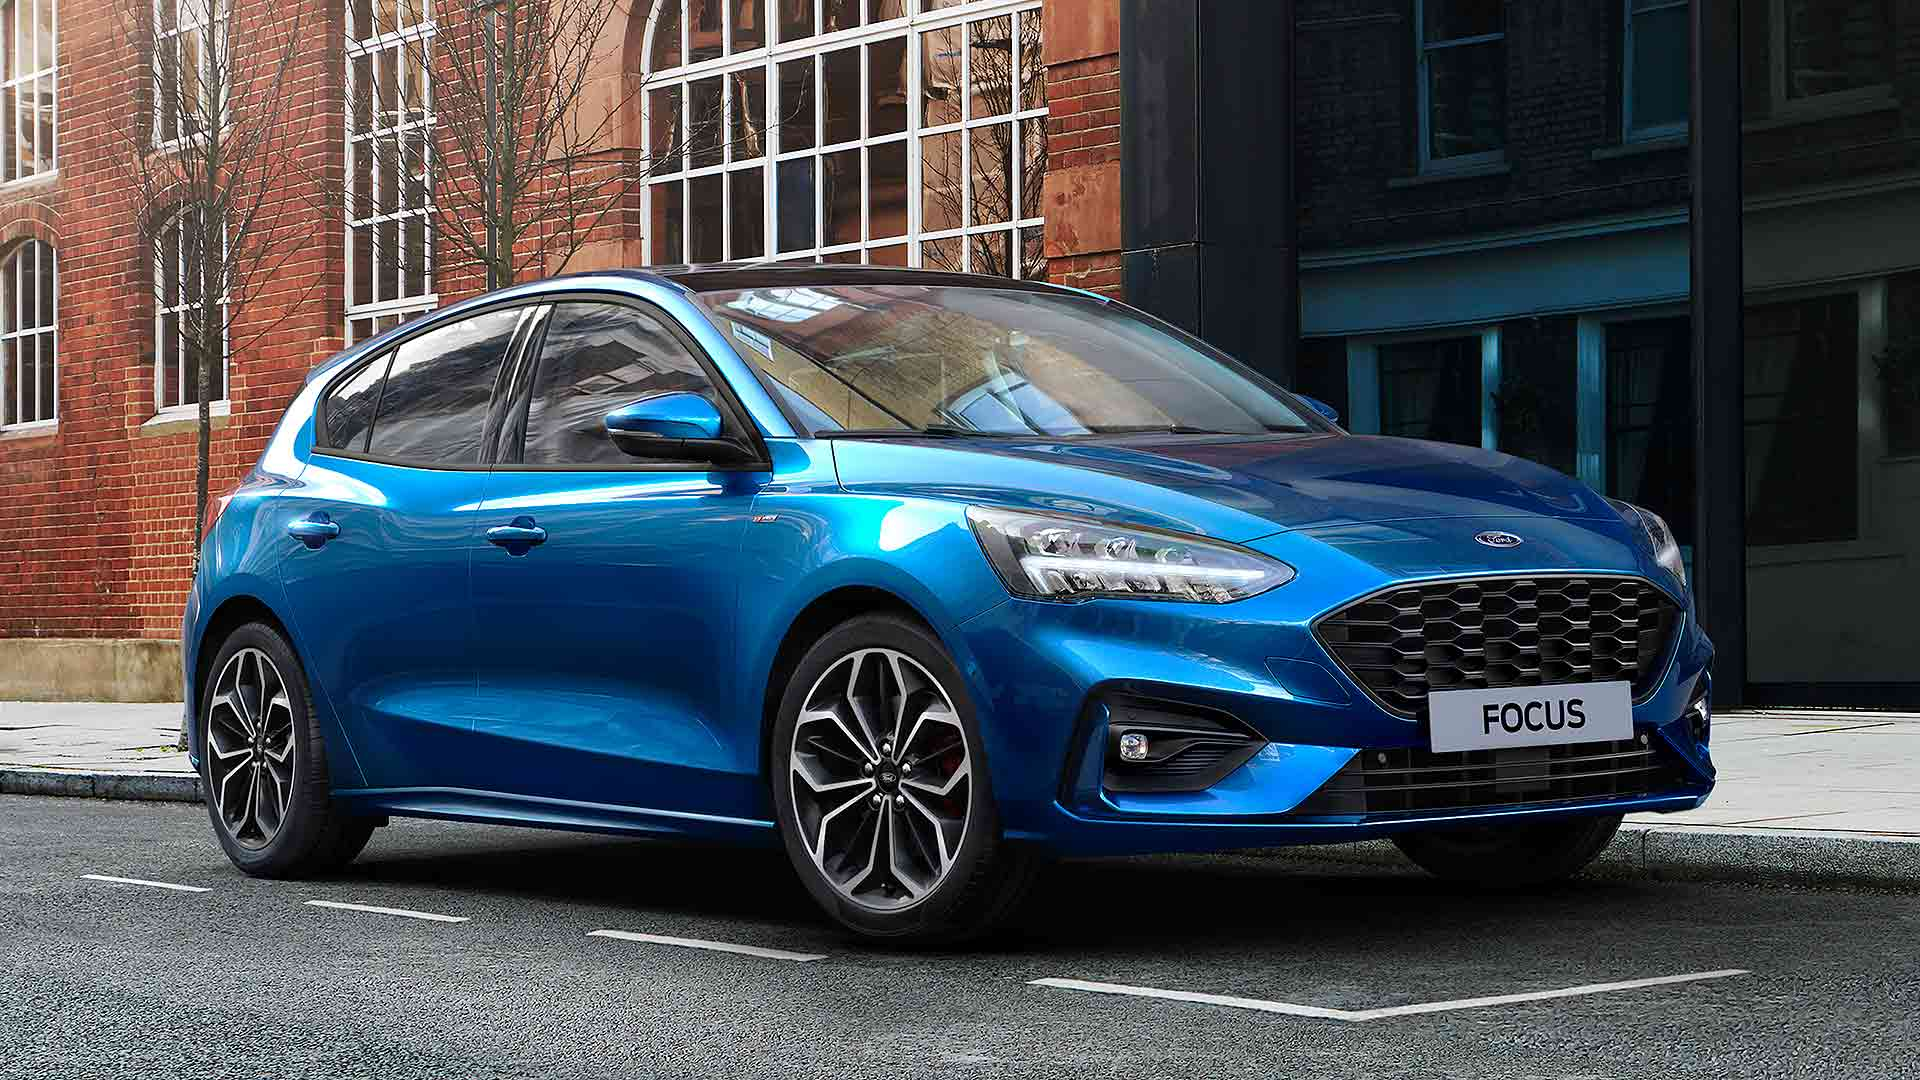 2020 Ford Focus Ecoboost Hybrid in blue